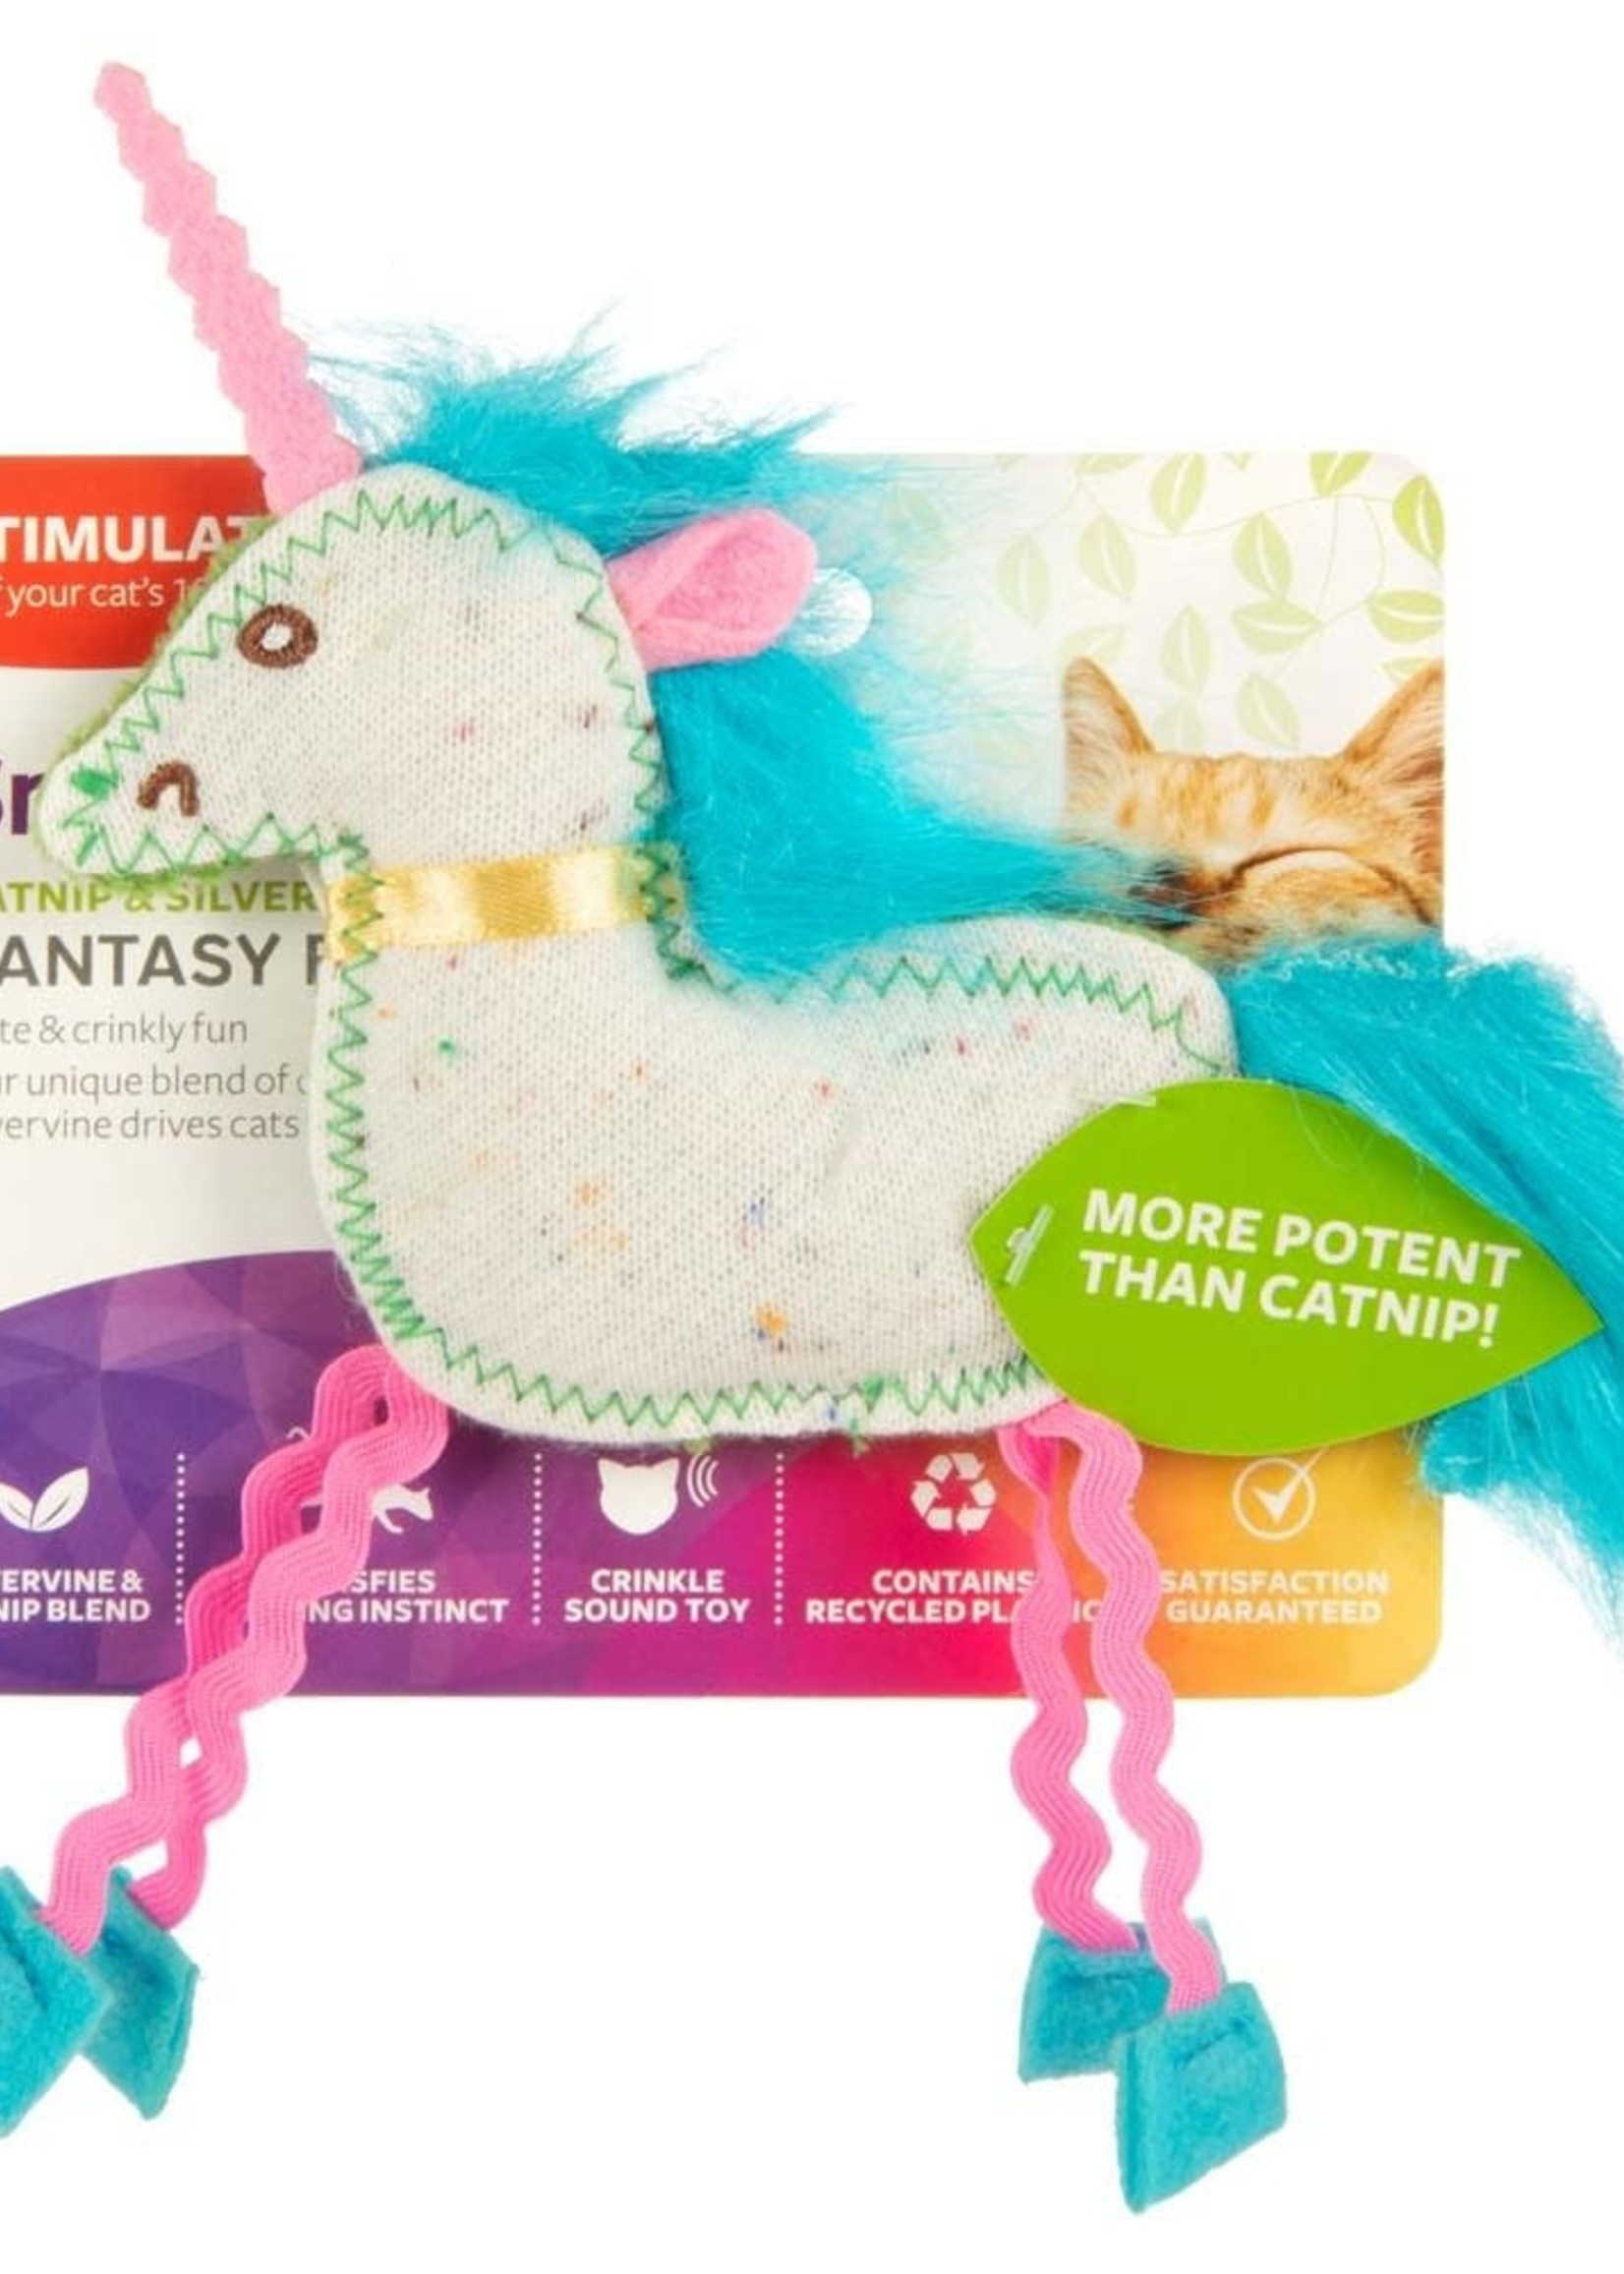 WORLDWISE INC / PET LINKS SmartyKat Fantasy Frenzy Crinkle Unicorn Catnip and Silvervine Cat Toy